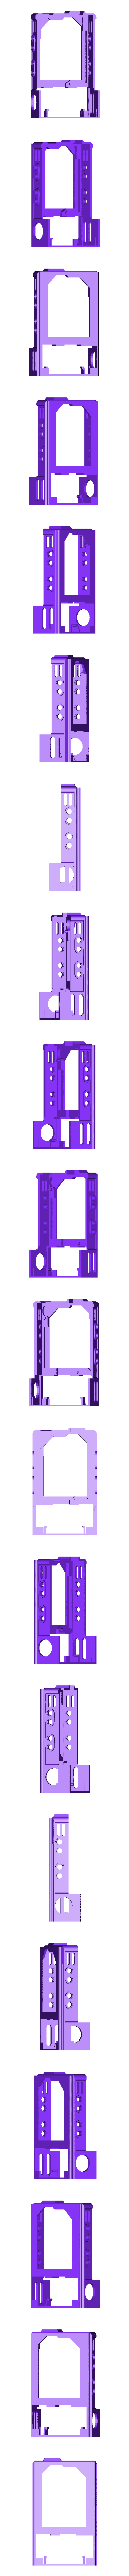 bbBasePLXPIR.stl Télécharger fichier STL gratuit badBrick - bbBasePLXPIR, capteur Parallax PIR (Rev B) + cas de base Arduino UNO R3. • Plan imprimable en 3D, Lassaalk